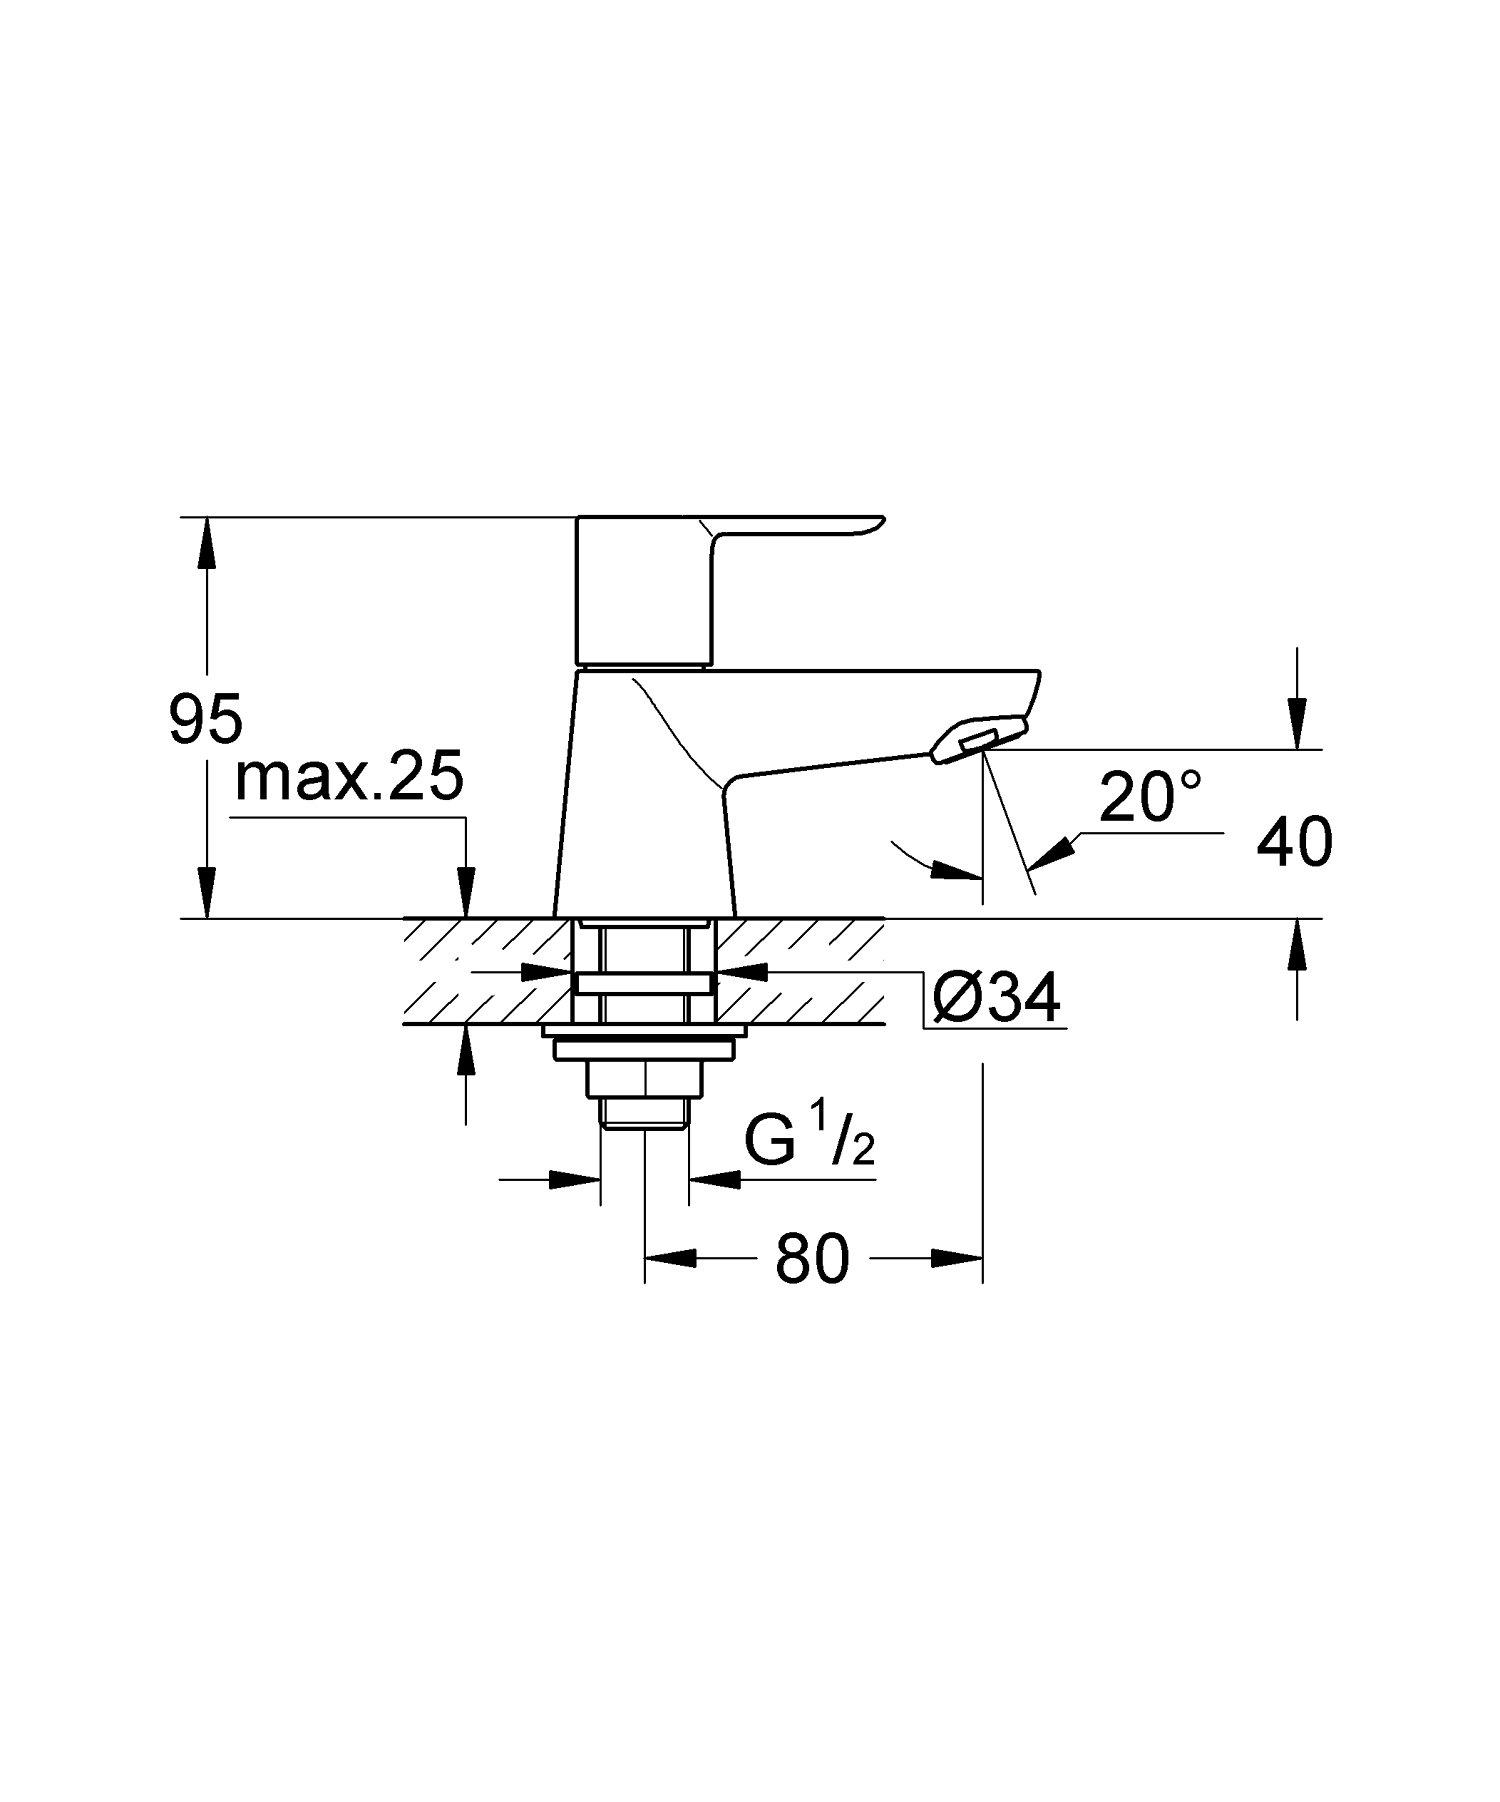 Grifo de lavabo con cadenilla Ref 23336000 Tama/ño S Grohe Loop